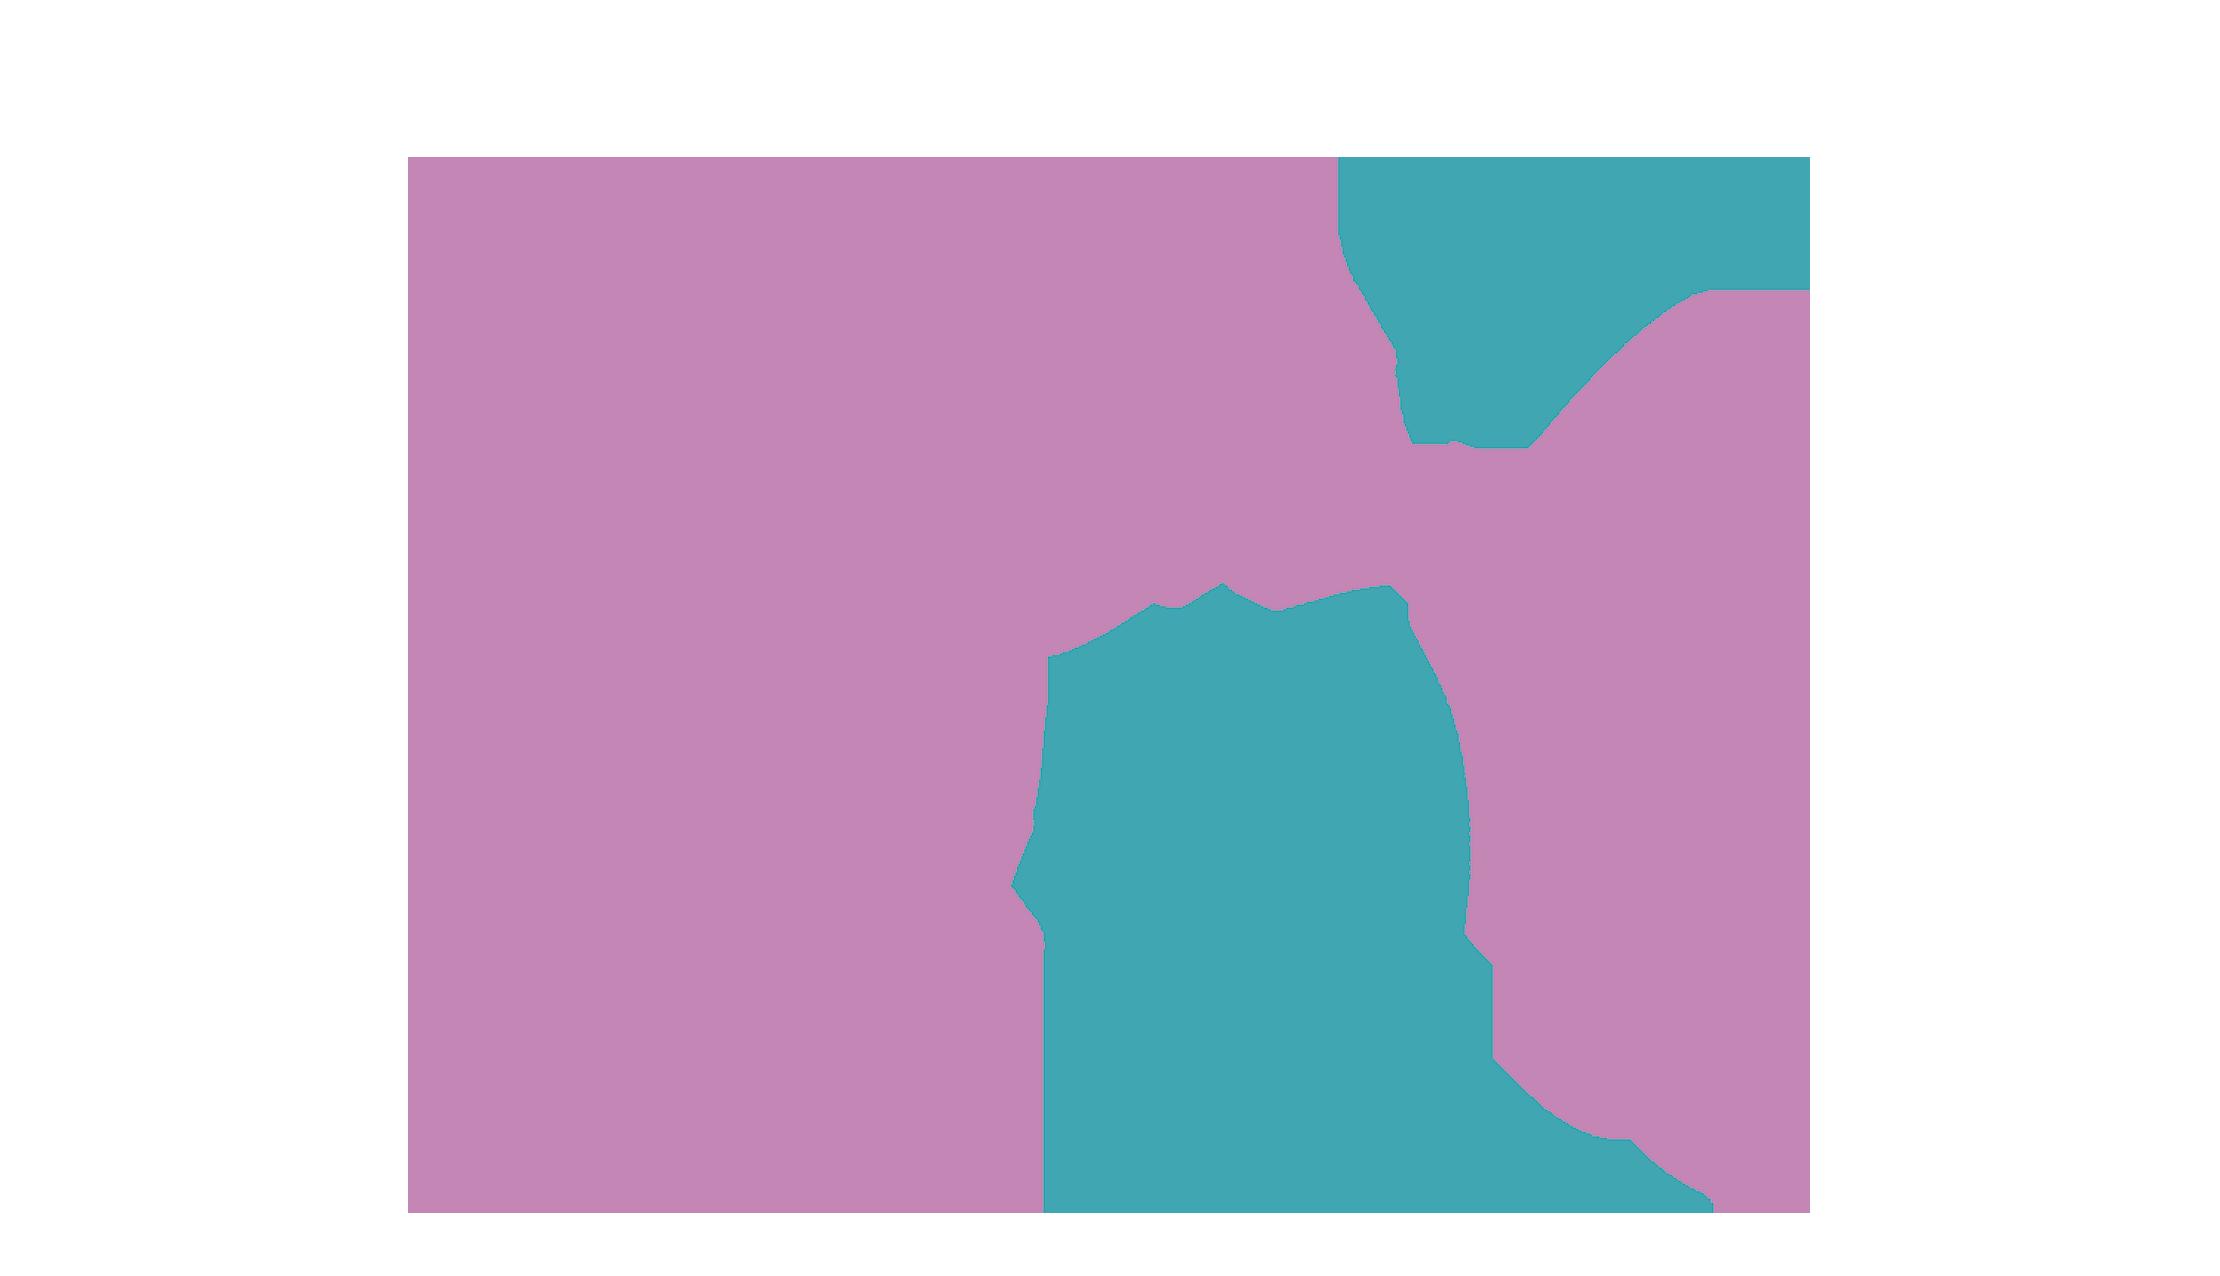 MagicMeow